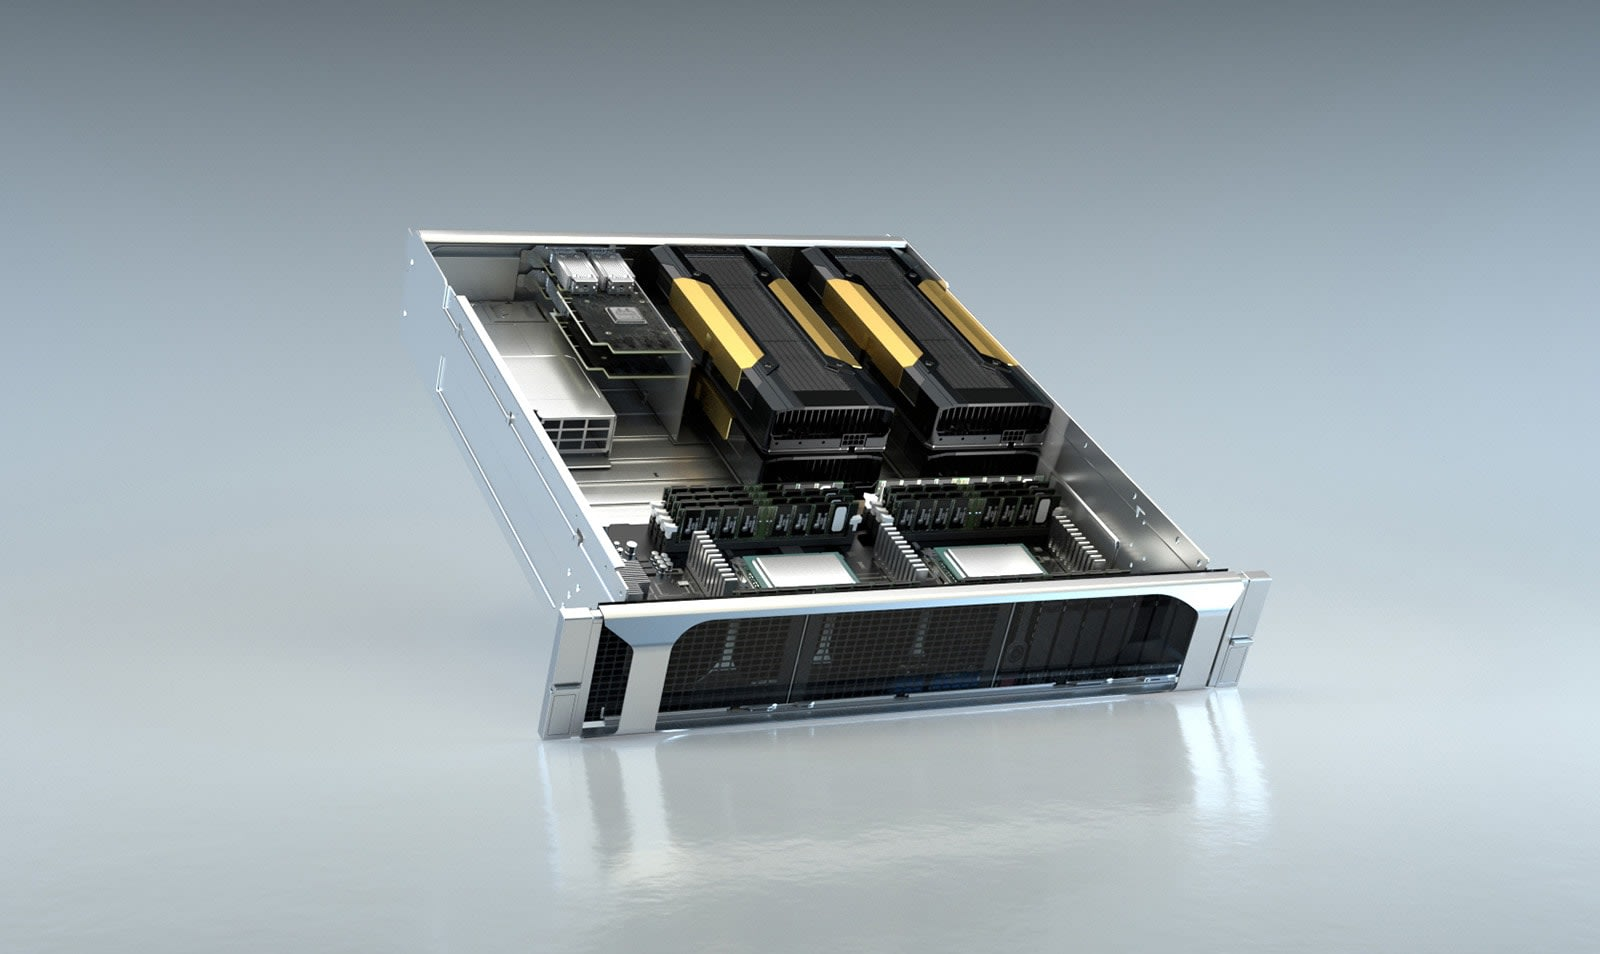 NVIDIA's EGX supercomputer tech can crunch 1.6 terabytes a second